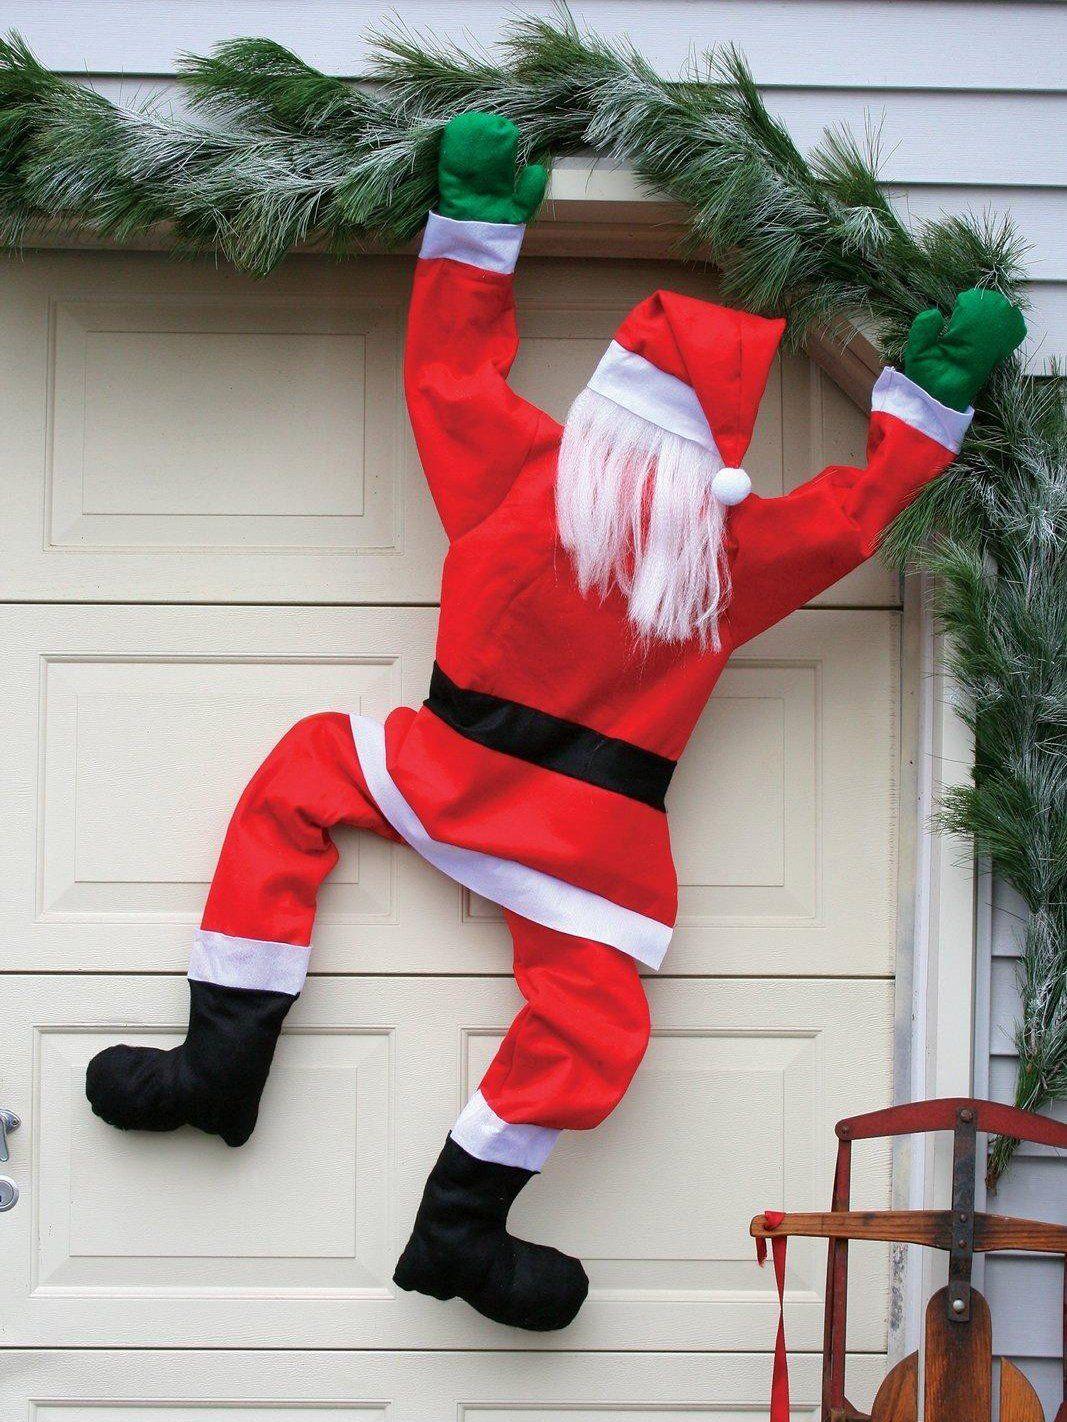 Xmas Decorations Climbing Santa Claus Large